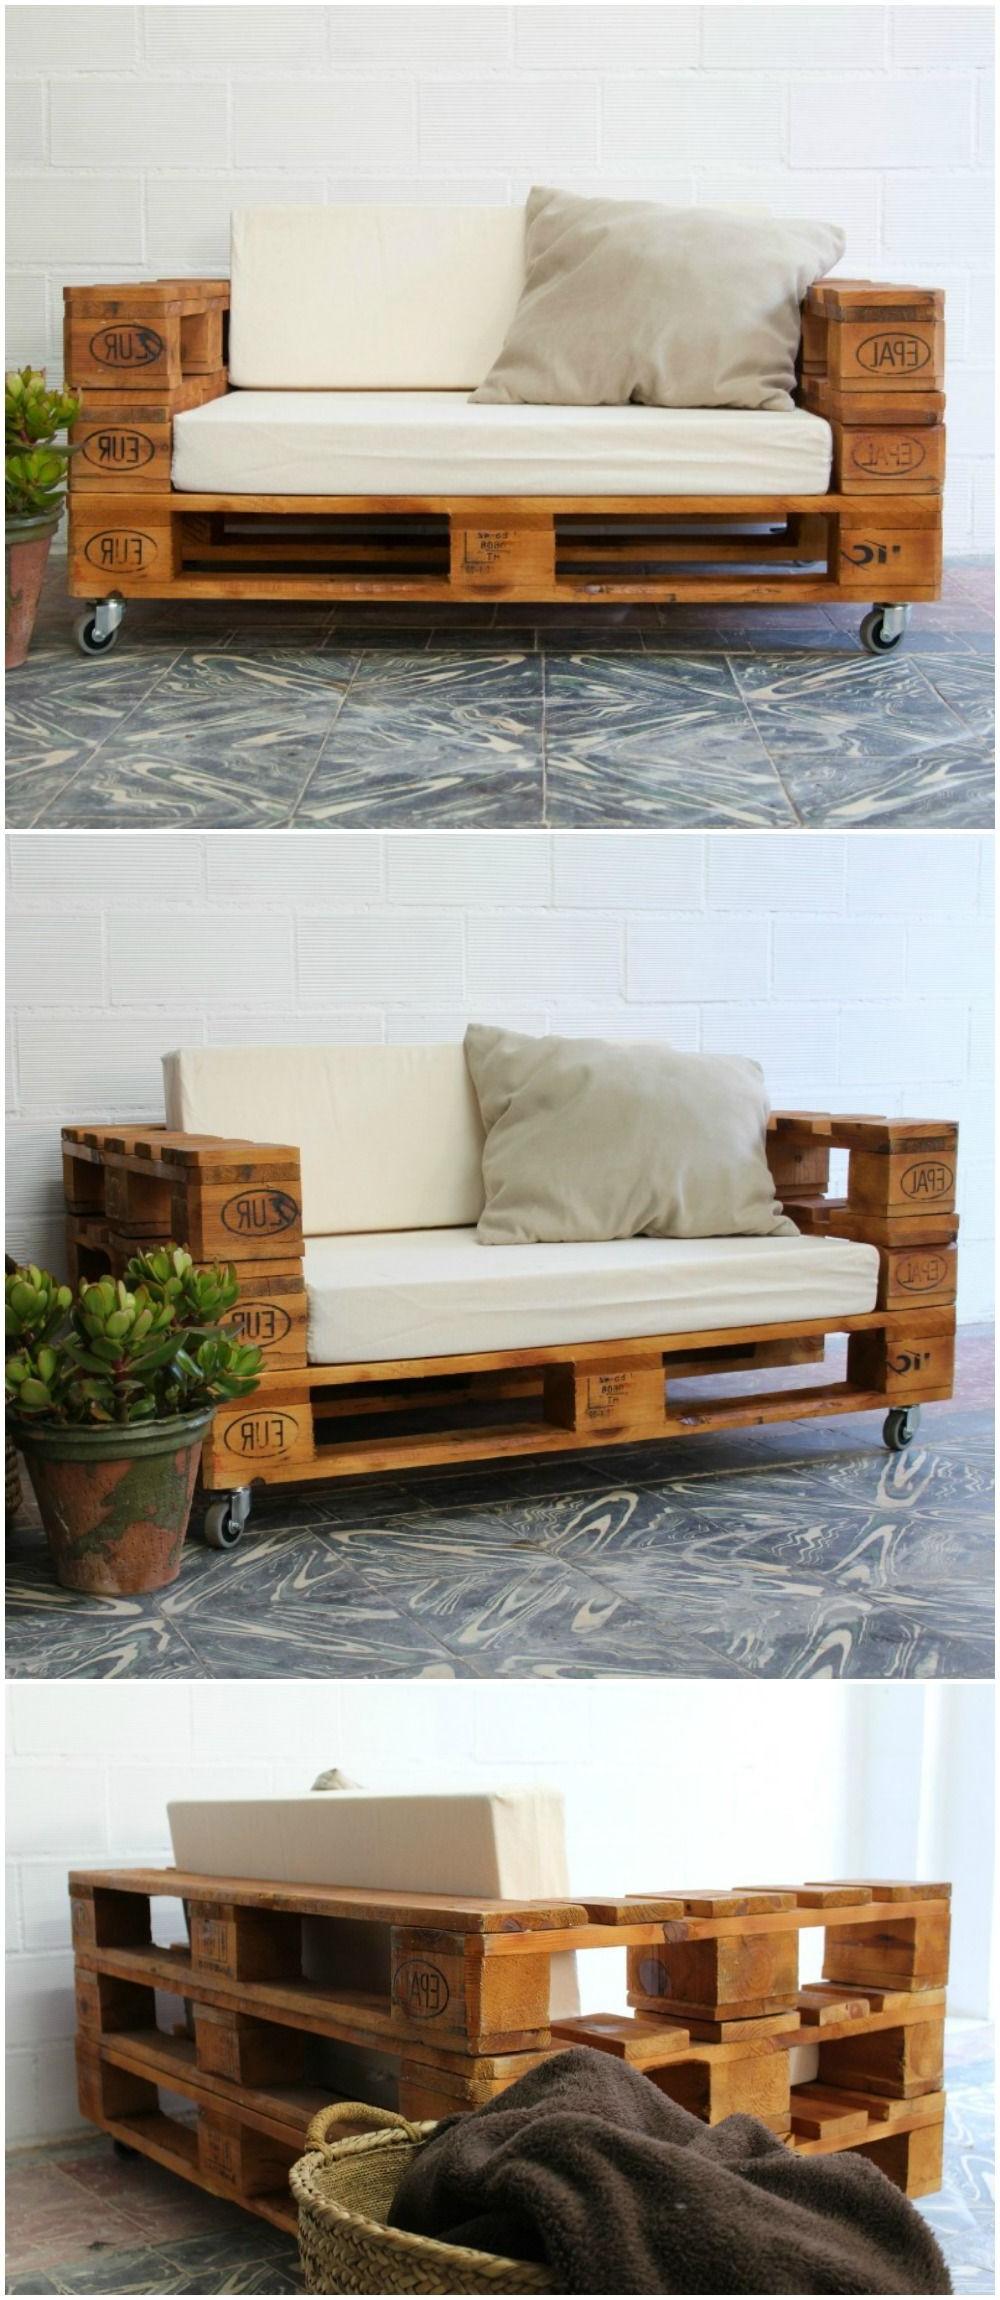 Sofas De Diseño Baratos X8d1 Muebles De Madera Reciclada Reciclados Dise O Por Un Futuro M S Ecol